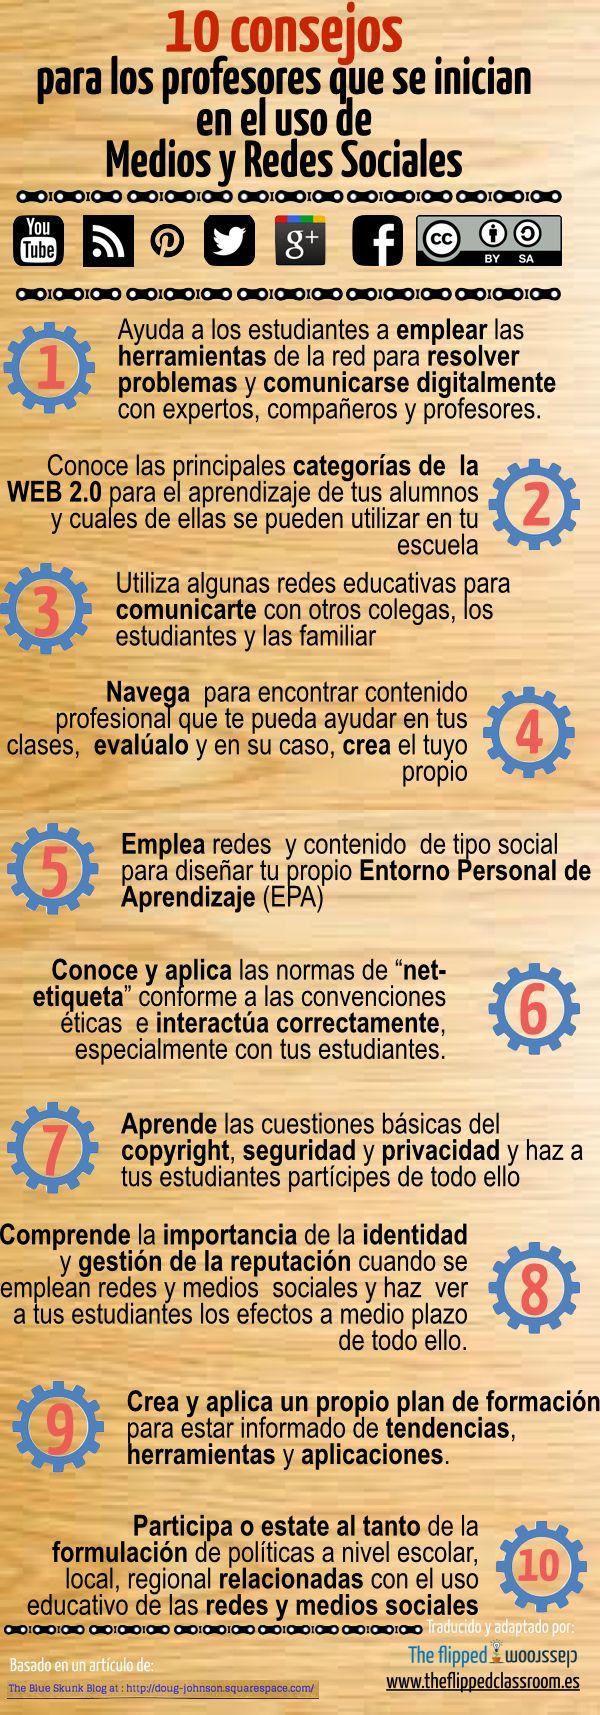 RedesSocialesInternet10ConsejosDocentes-Infografía-BlogGesvin